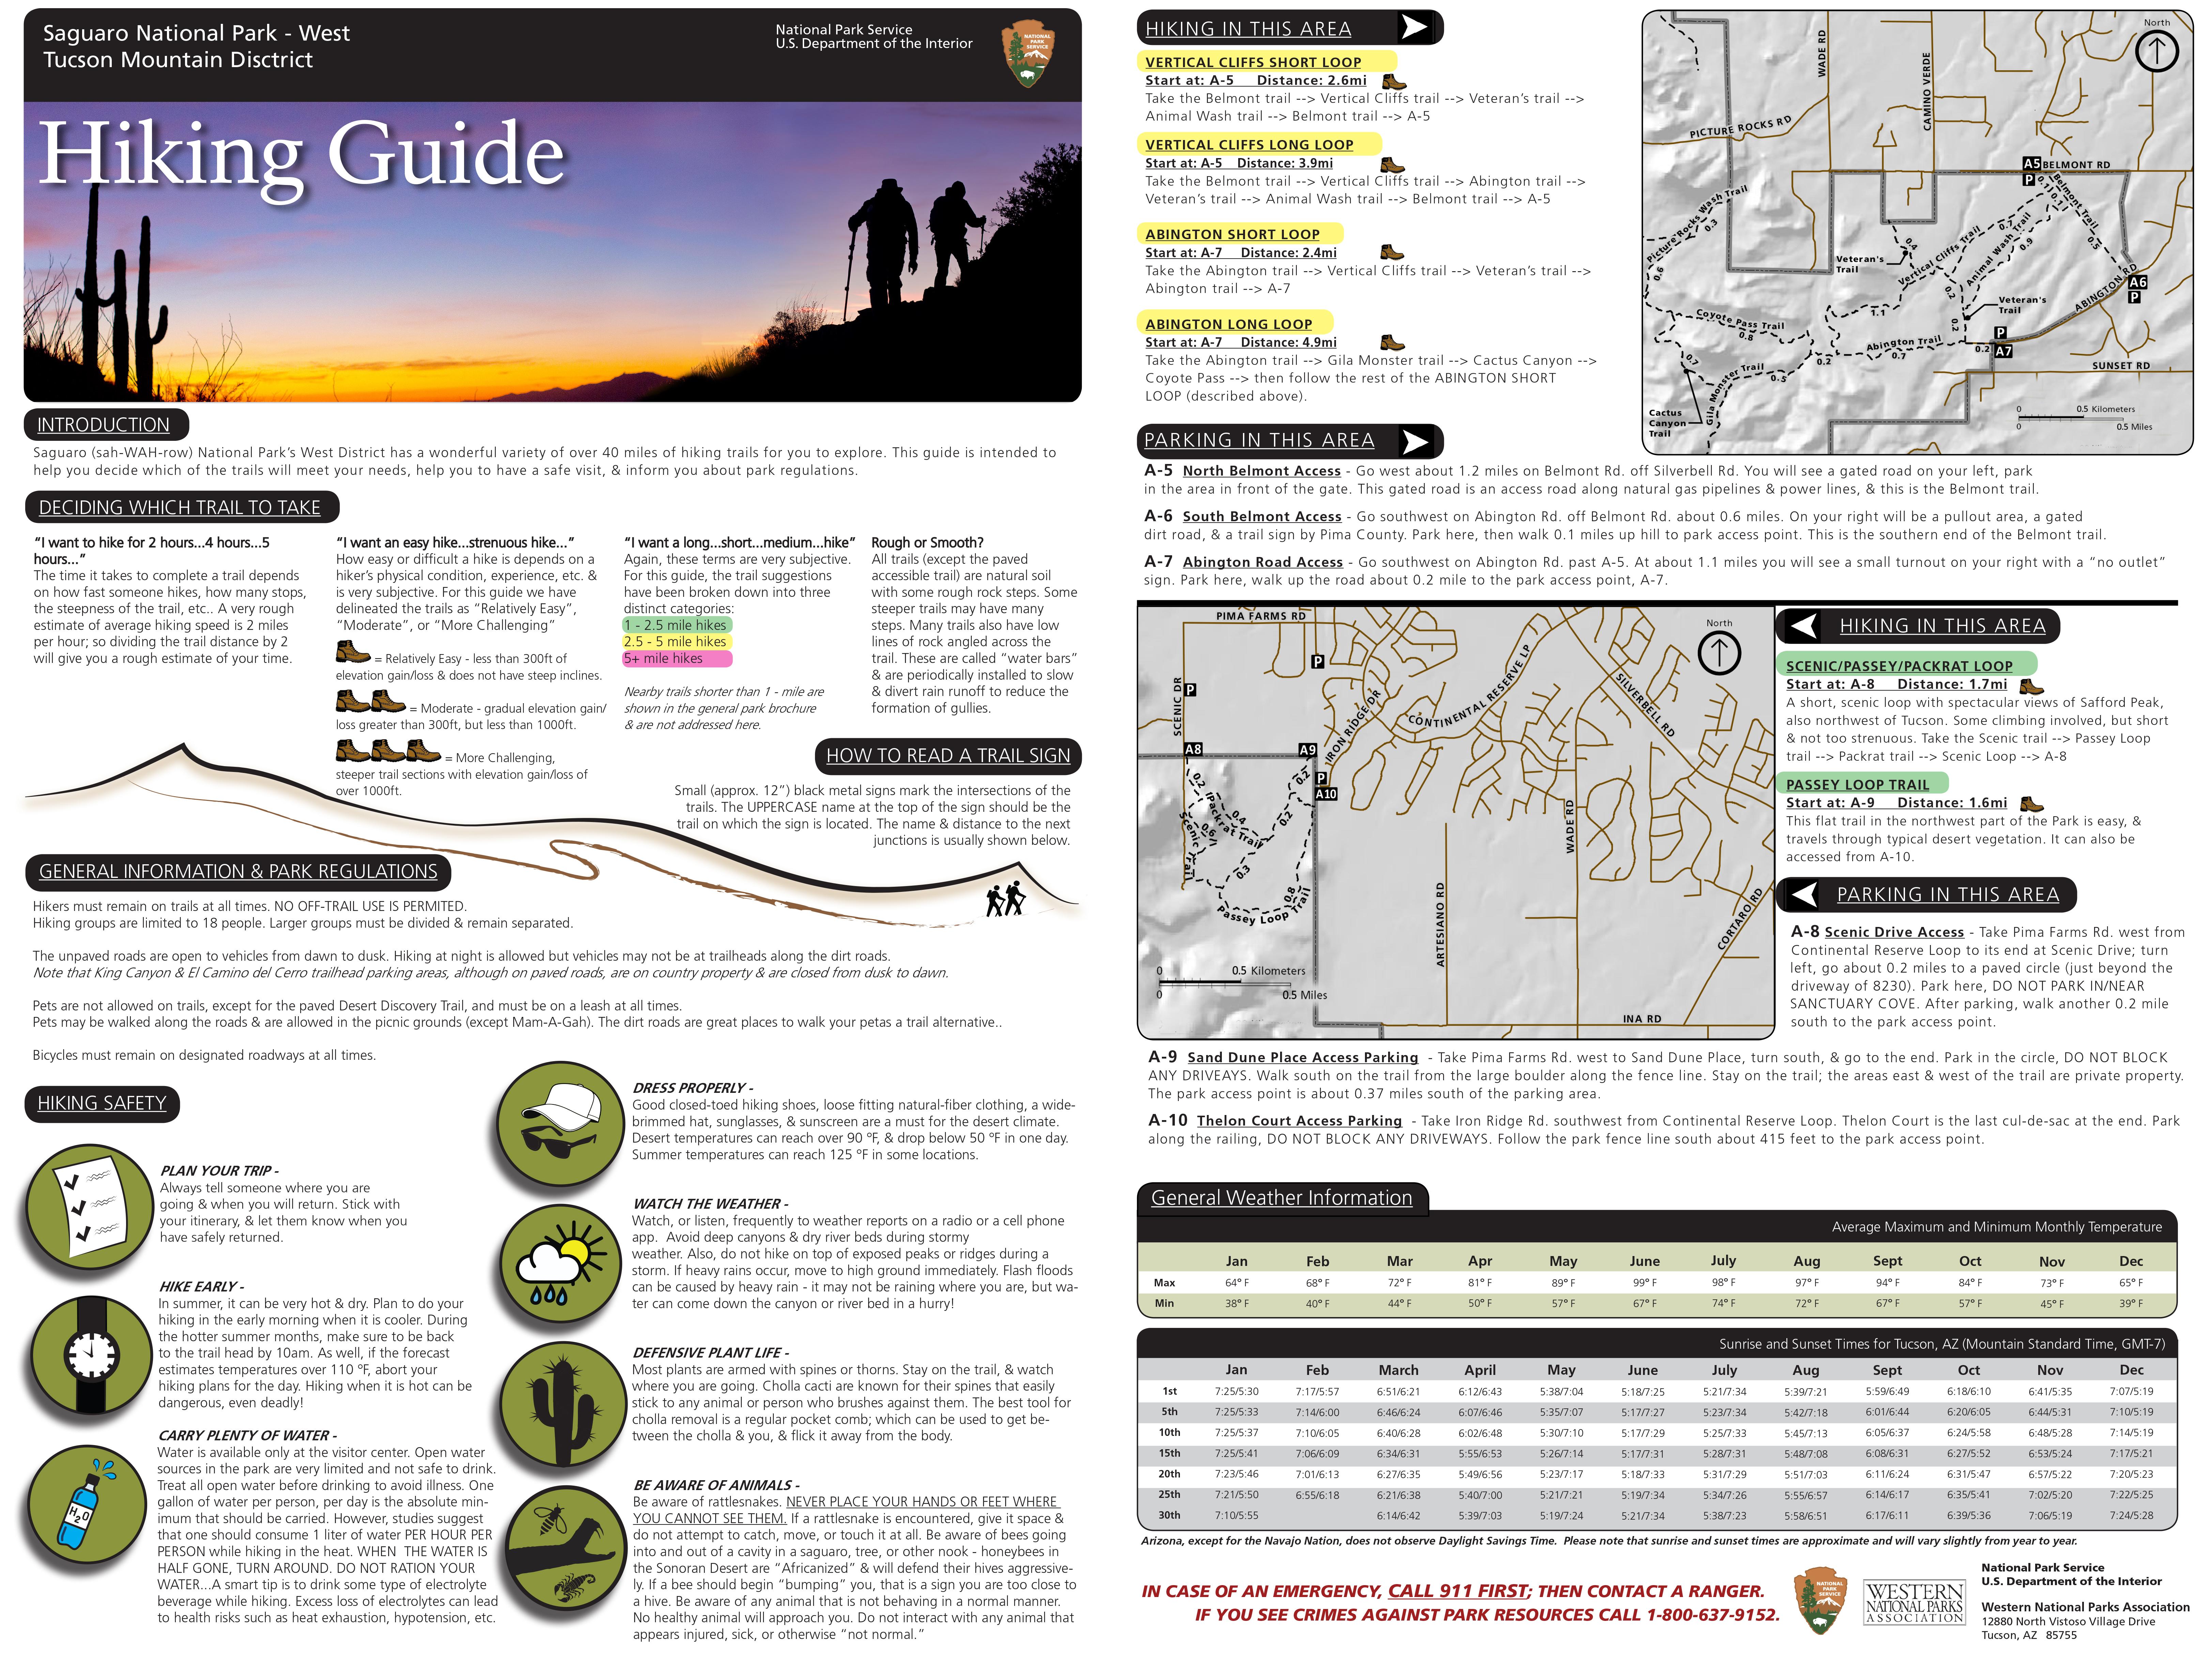 Hiking Guide, TMD - Hiking Guide, TMD